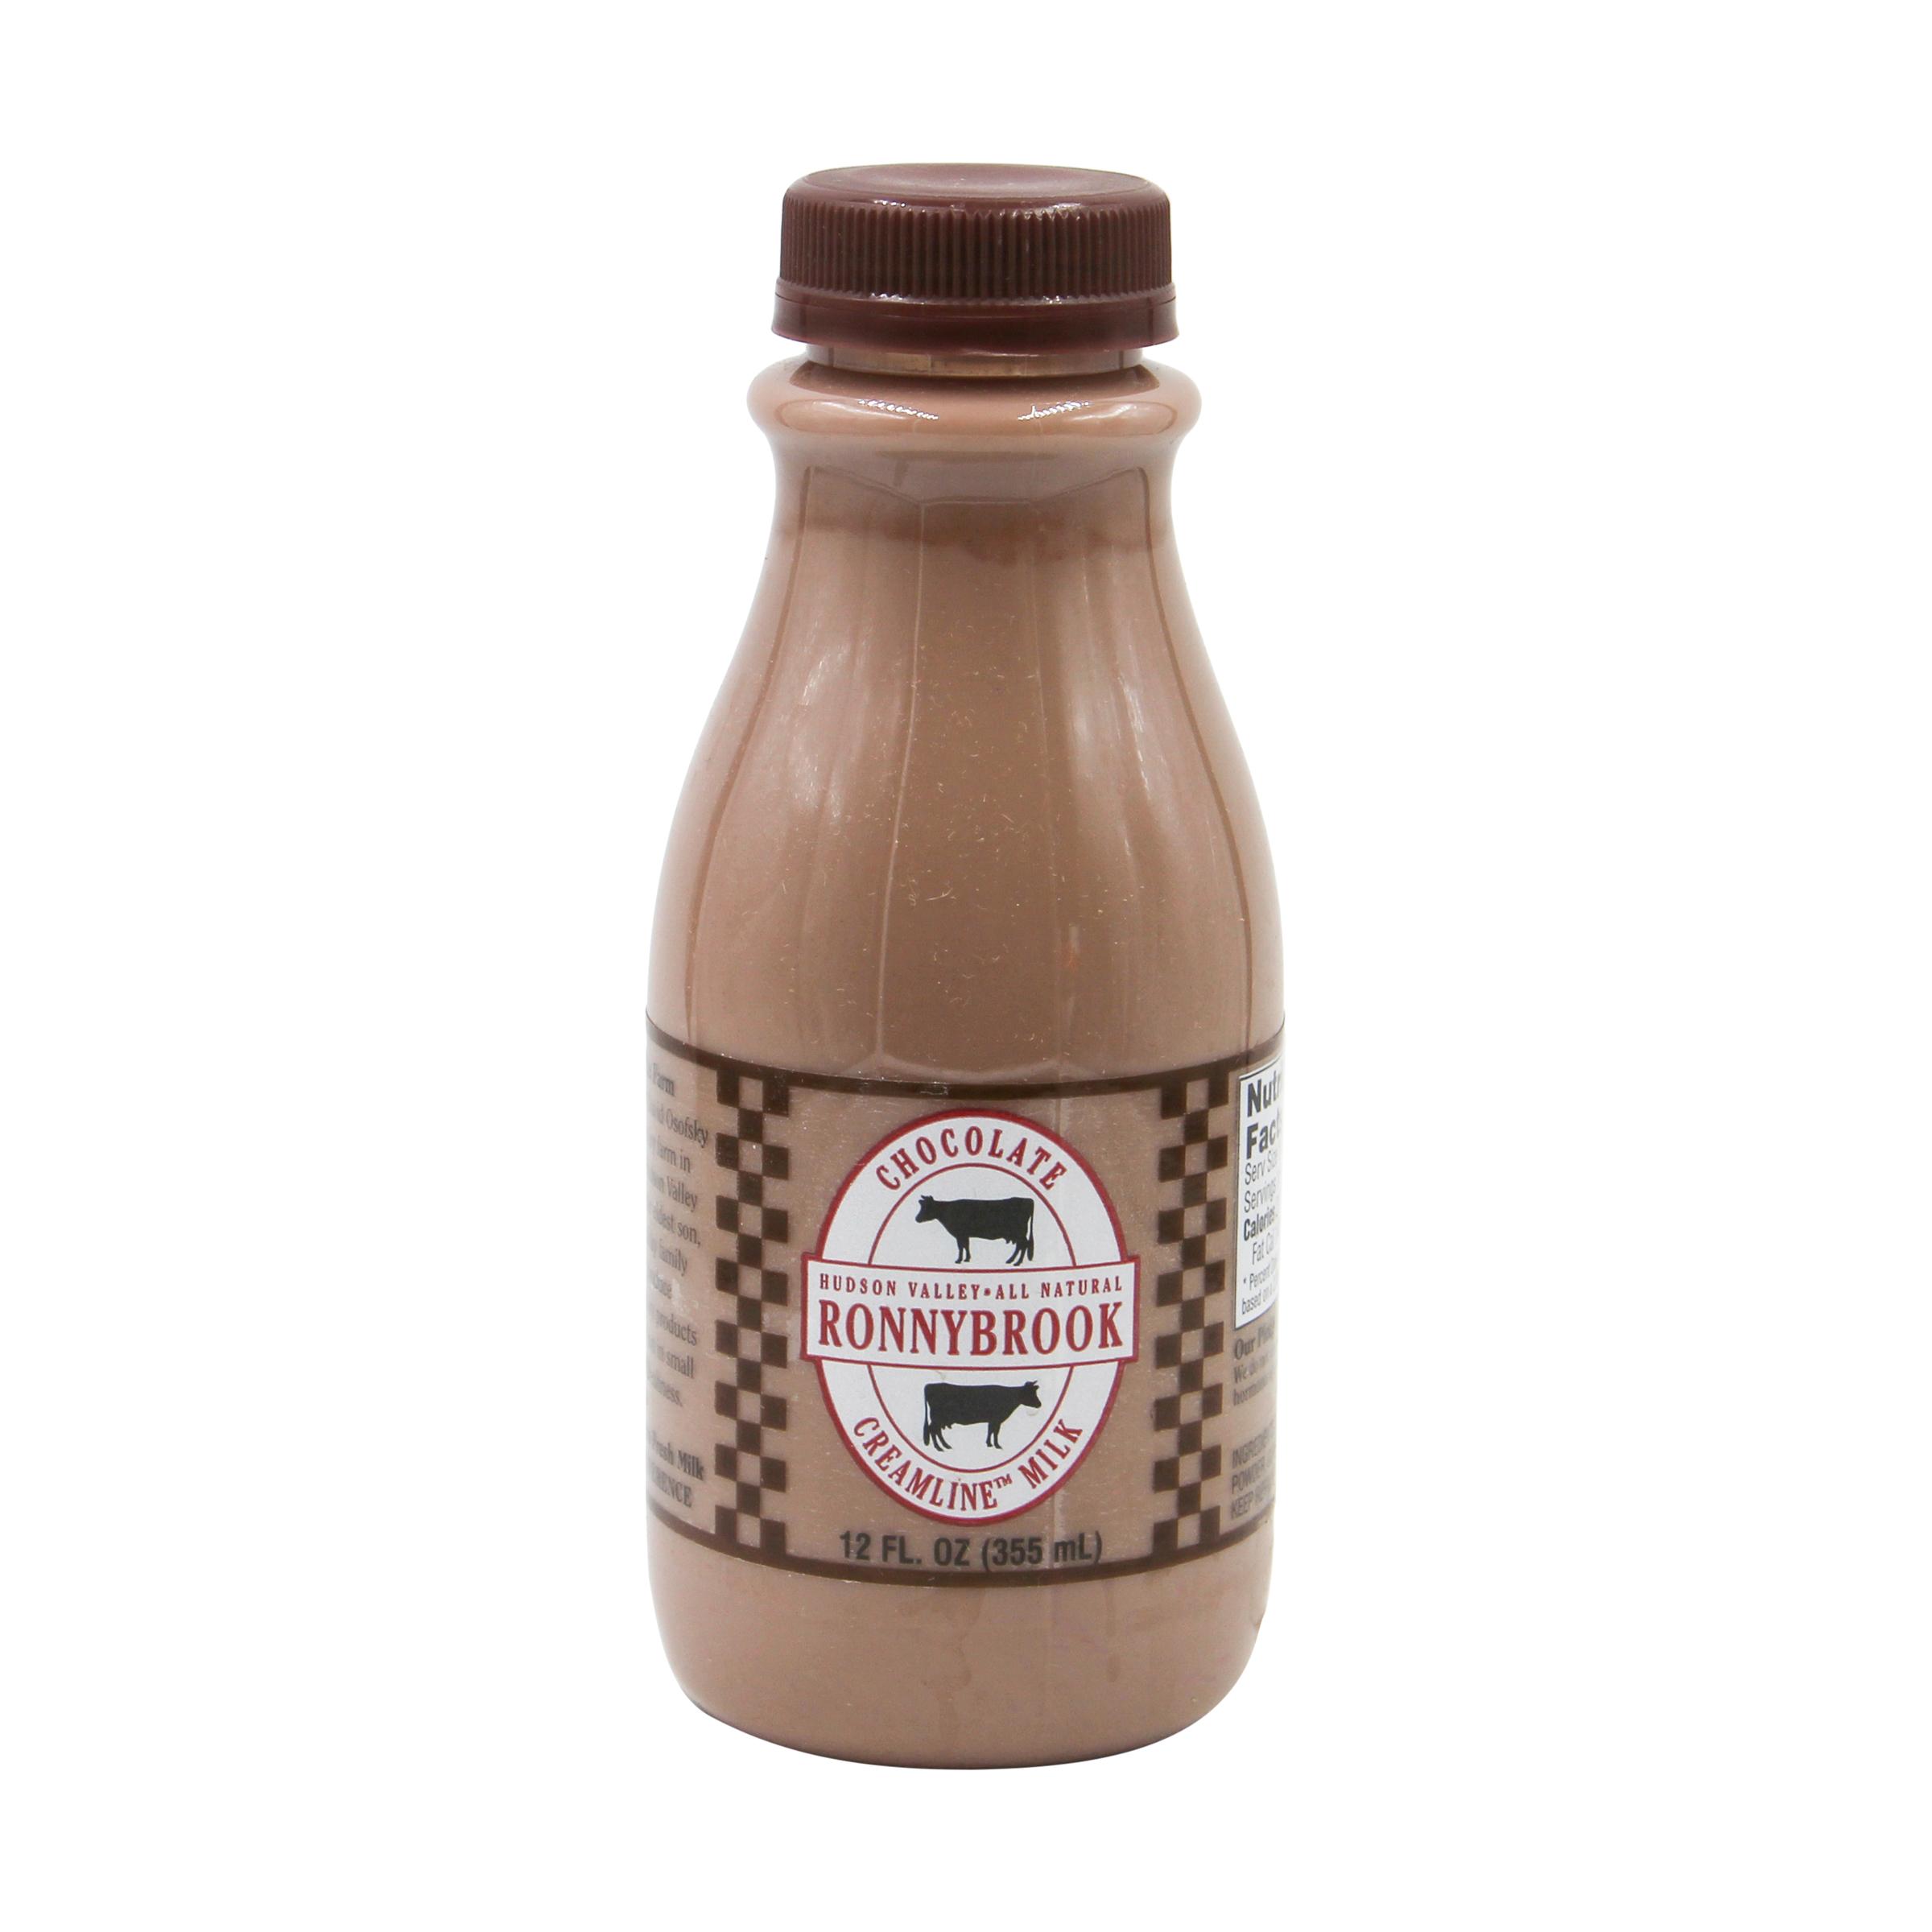 Chocolate Creamline Milk, 12 fl  oz , Ronnybrook Farm Dairy